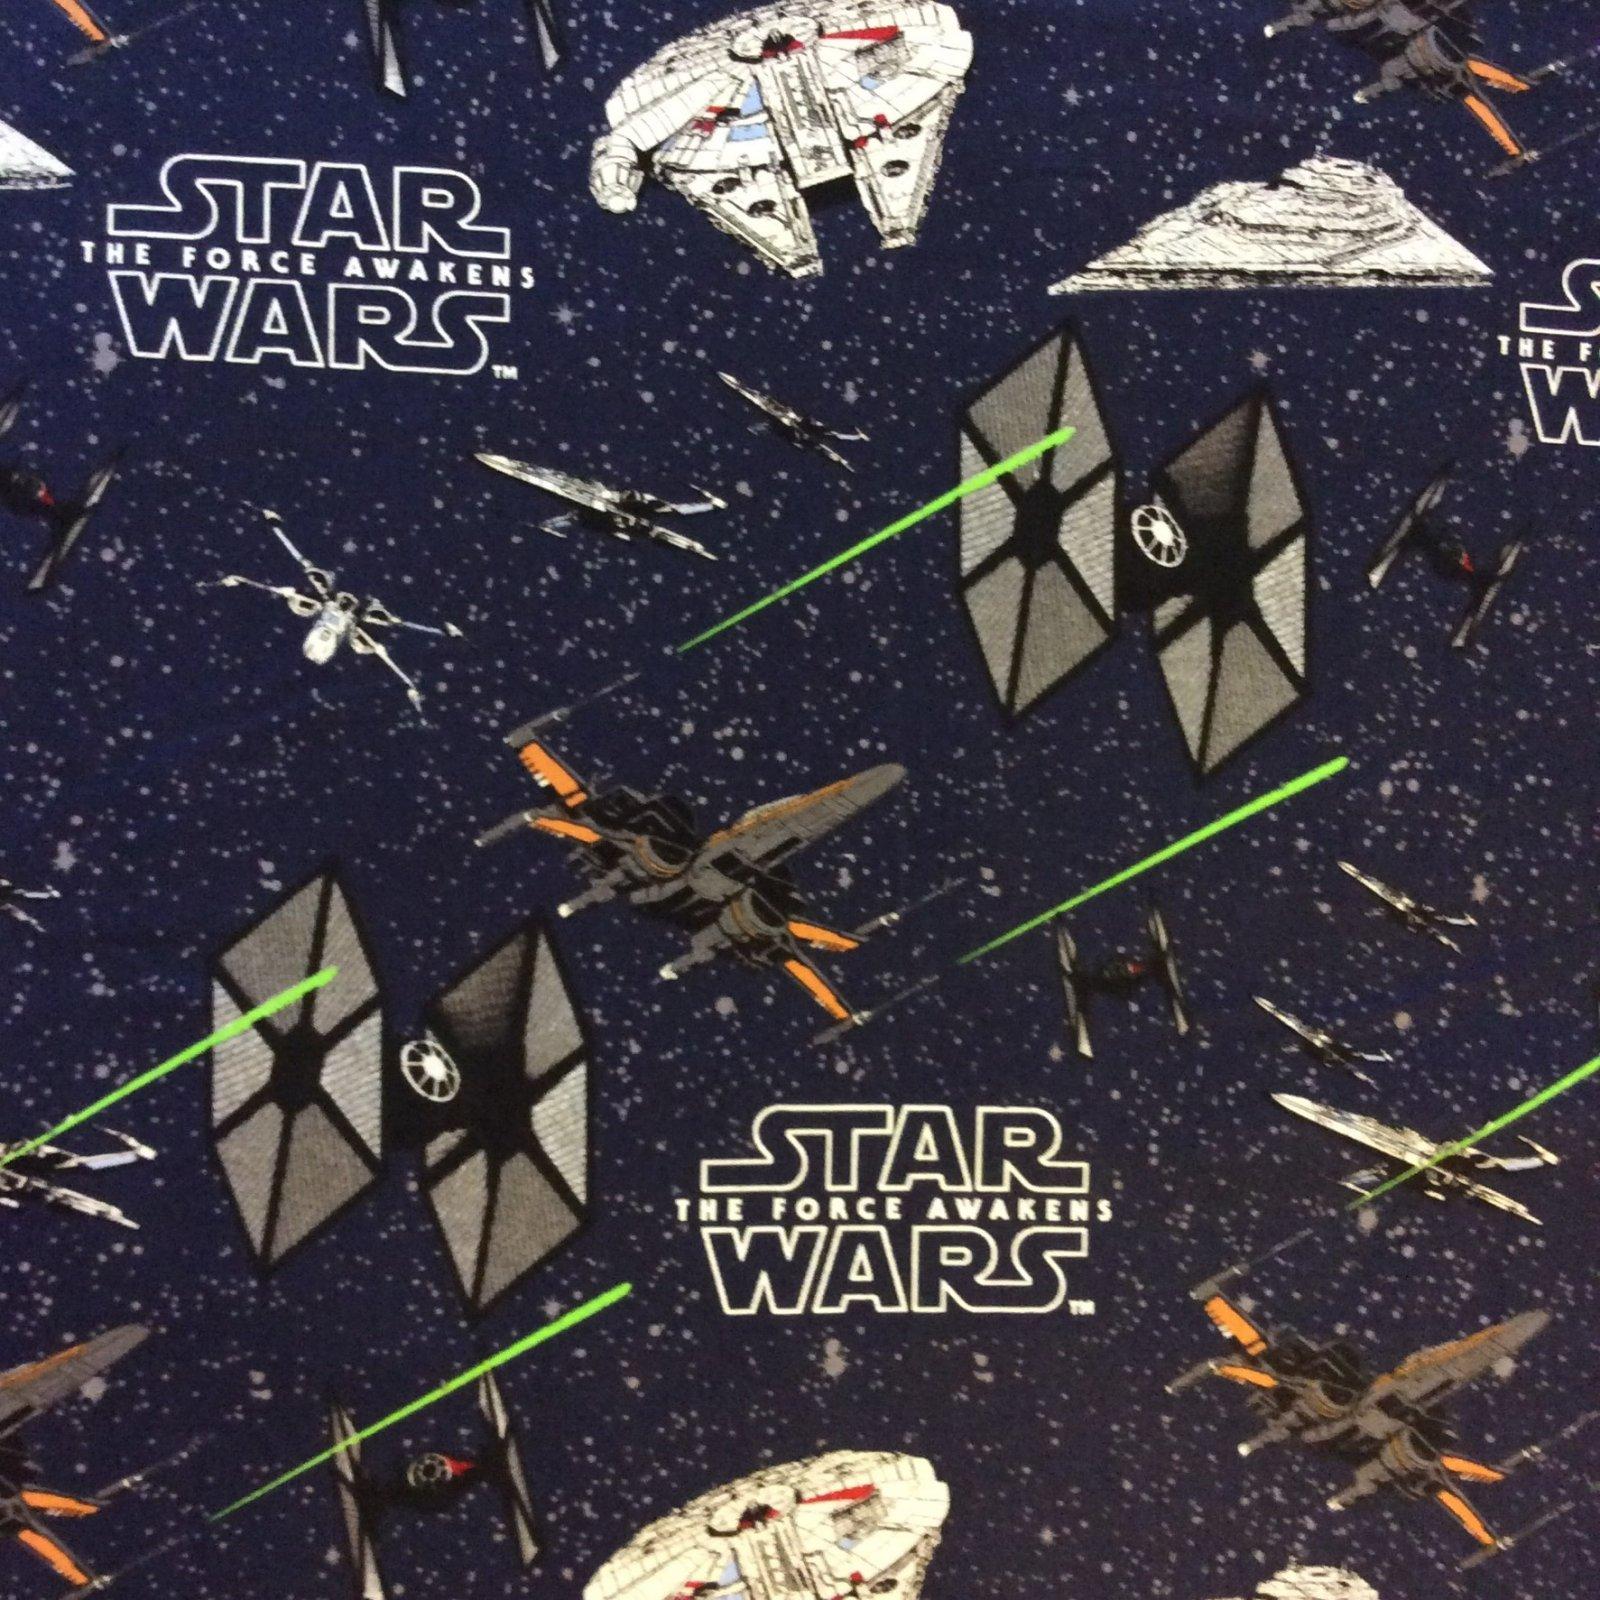 Star Wars The Force Awakens Empire Millennium Falcon Rebels Lucas Films Movie Cotton Quilt Fabric FT86